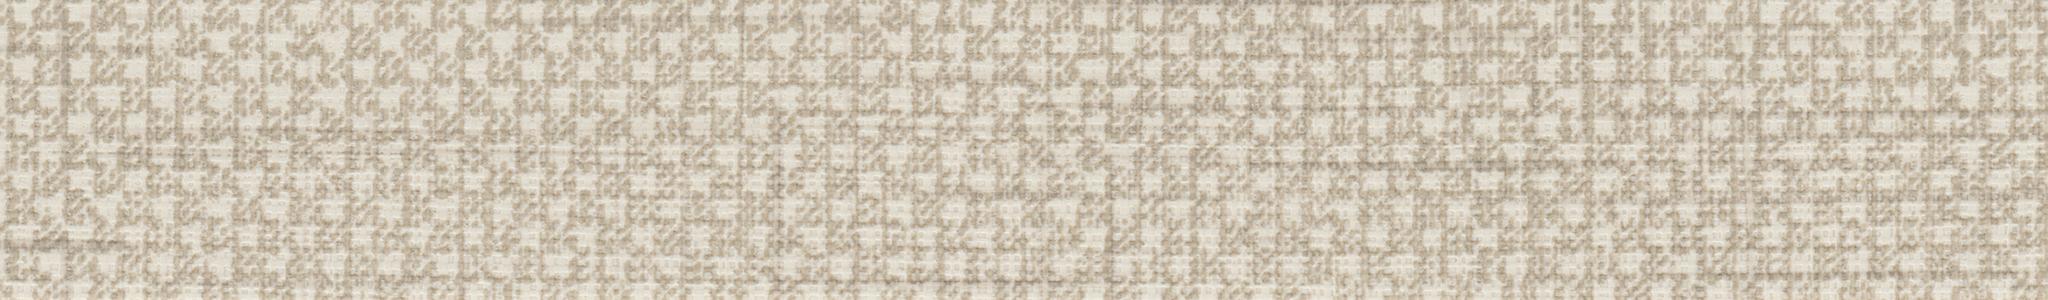 HD 292286 ABS hrana pytlovina gravír